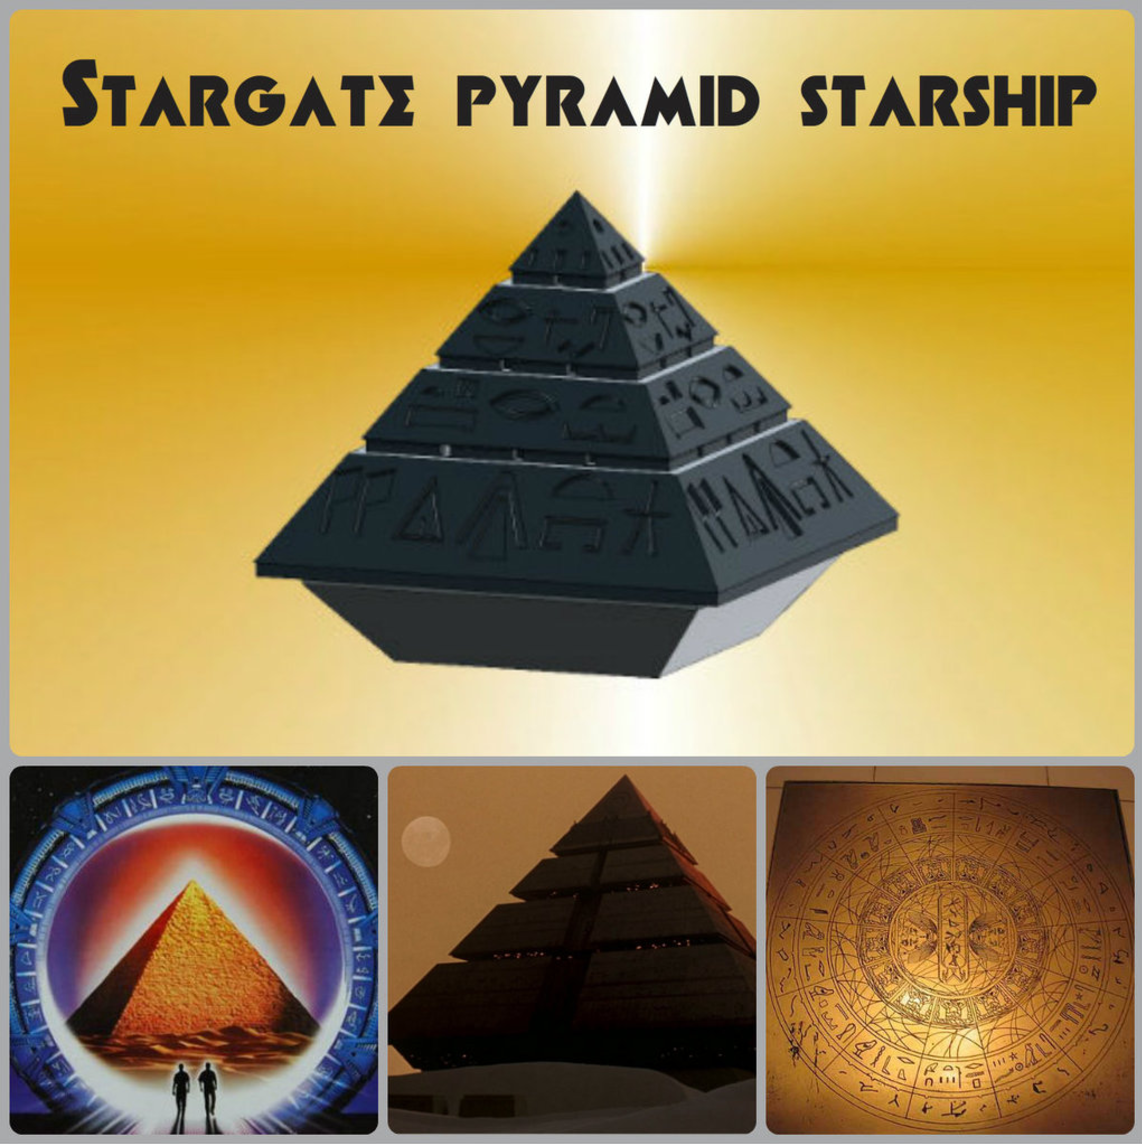 Capture d'écran 2017-02-06 à 10.12.30.png Download free STL file Piramid Starship Stargate • 3D printing design, TanyaAkinora